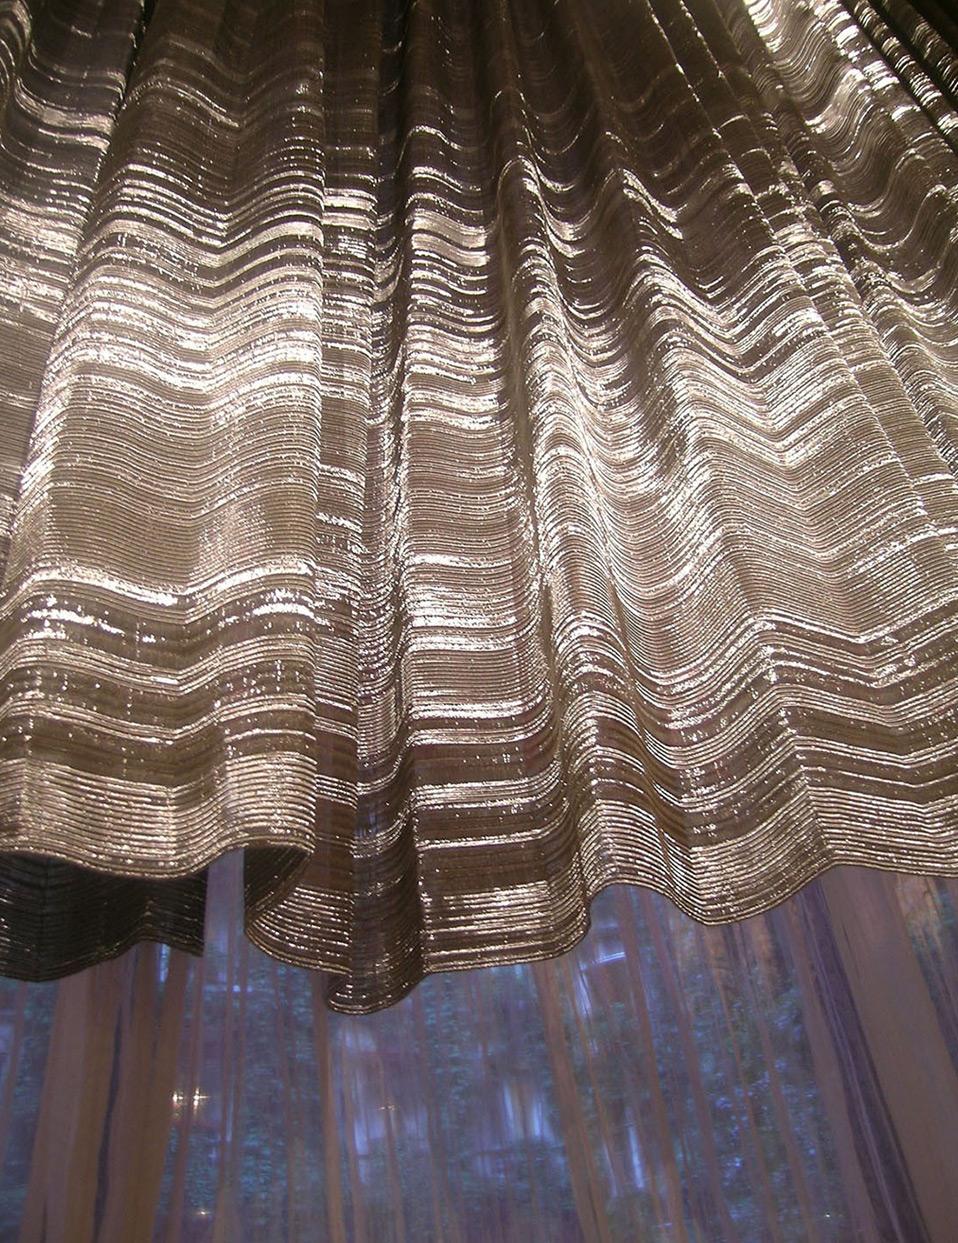 Sophie-Mallebranche-Plaza-Athenee-Restaurant-Hotel-Paris-Monumental-Curtains